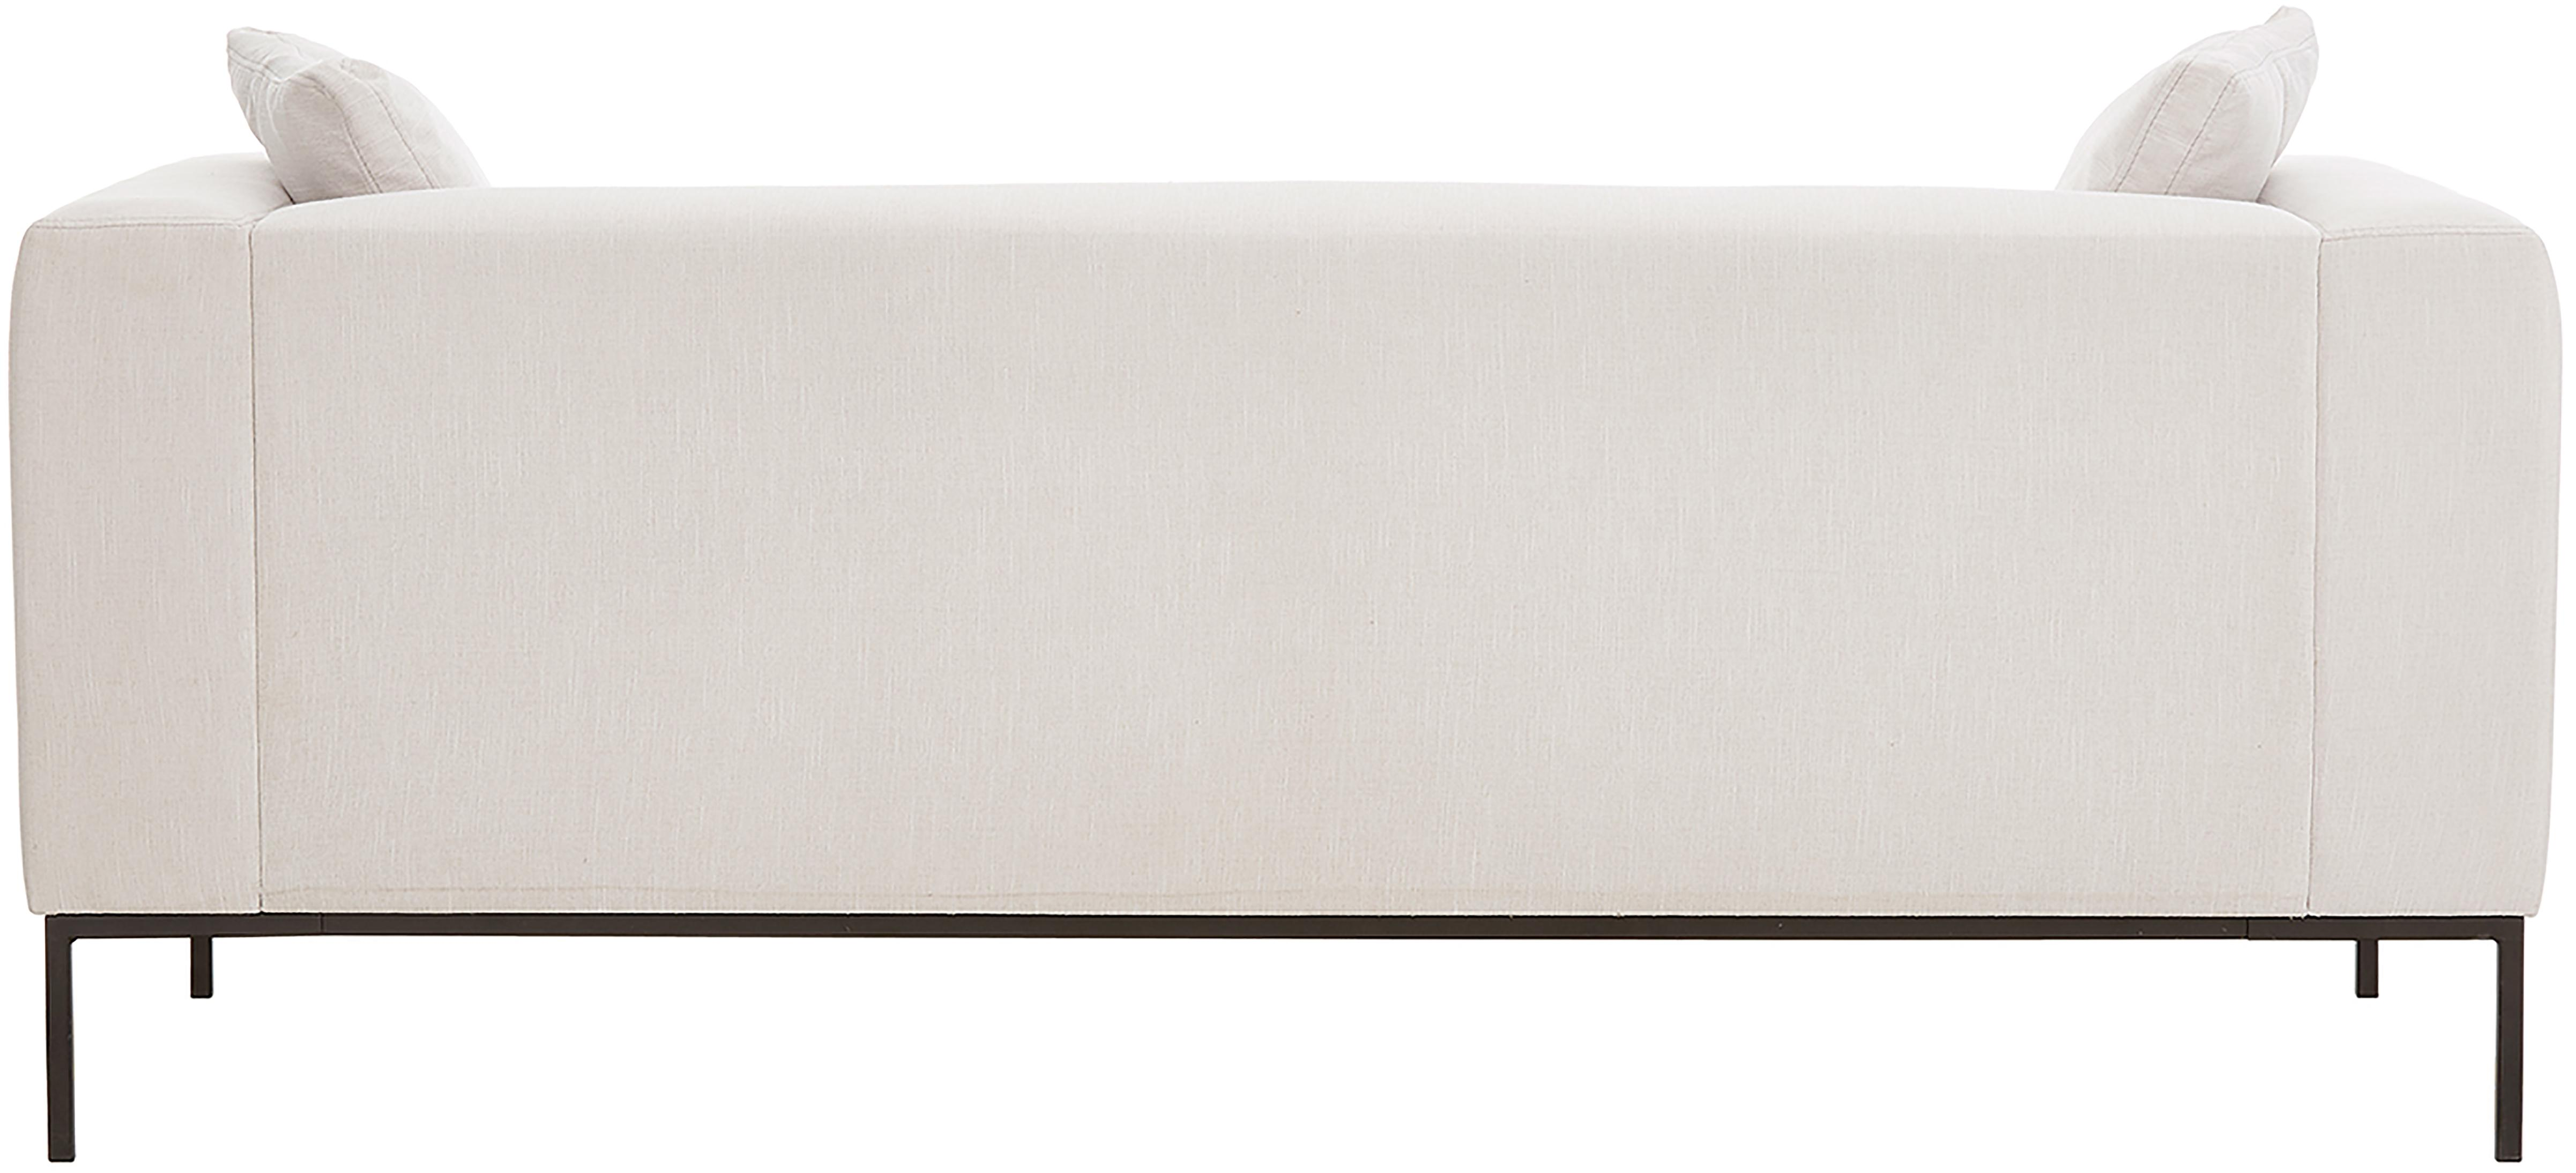 Sofa Carrie (3-Sitzer), Bezug: Polyester 50.000 Scheuert, Gestell: Spanholz, Hartfaserplatte, Füße: Metall, lackiert, Webstoff Beige, B 202 x T 86 cm